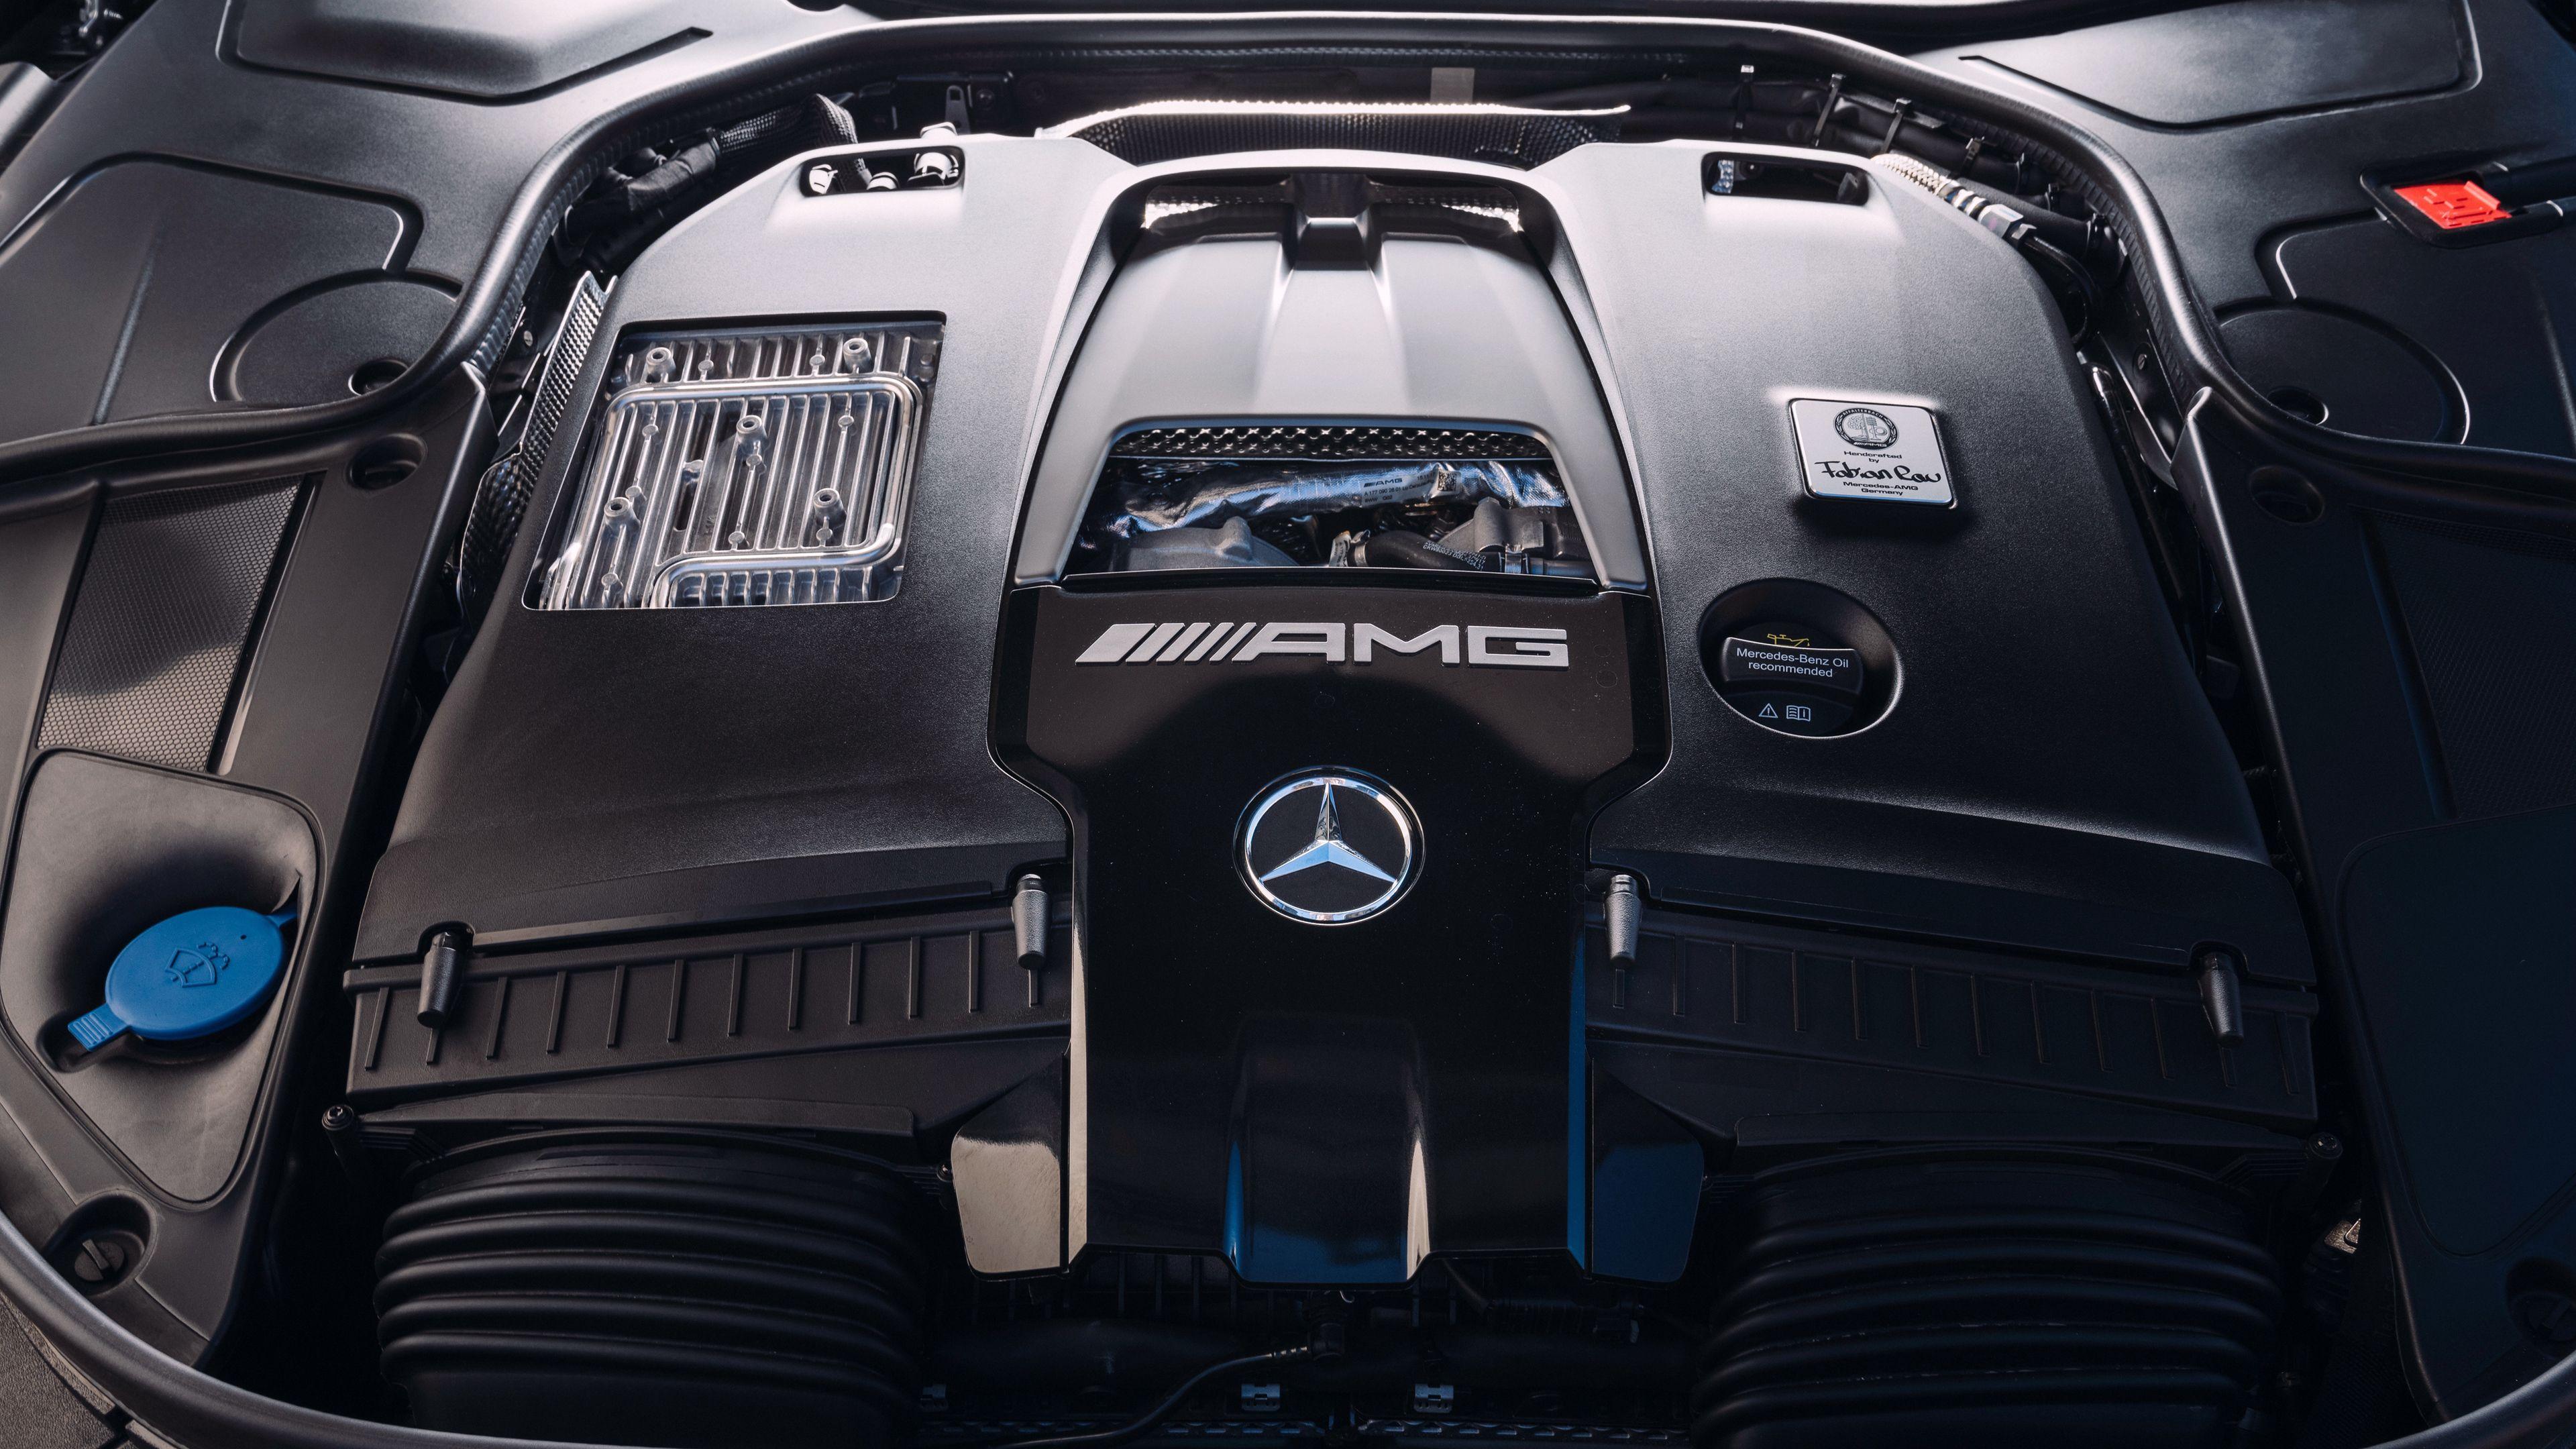 Mercedes Amg S63 2018 Engine View 4k Mercedes Wallpapers Mercedes S Class Wallpapers Mercedes Benz Wallpapers Hd Wa Mercedes Mercedes Amg Mercedes Wallpaper